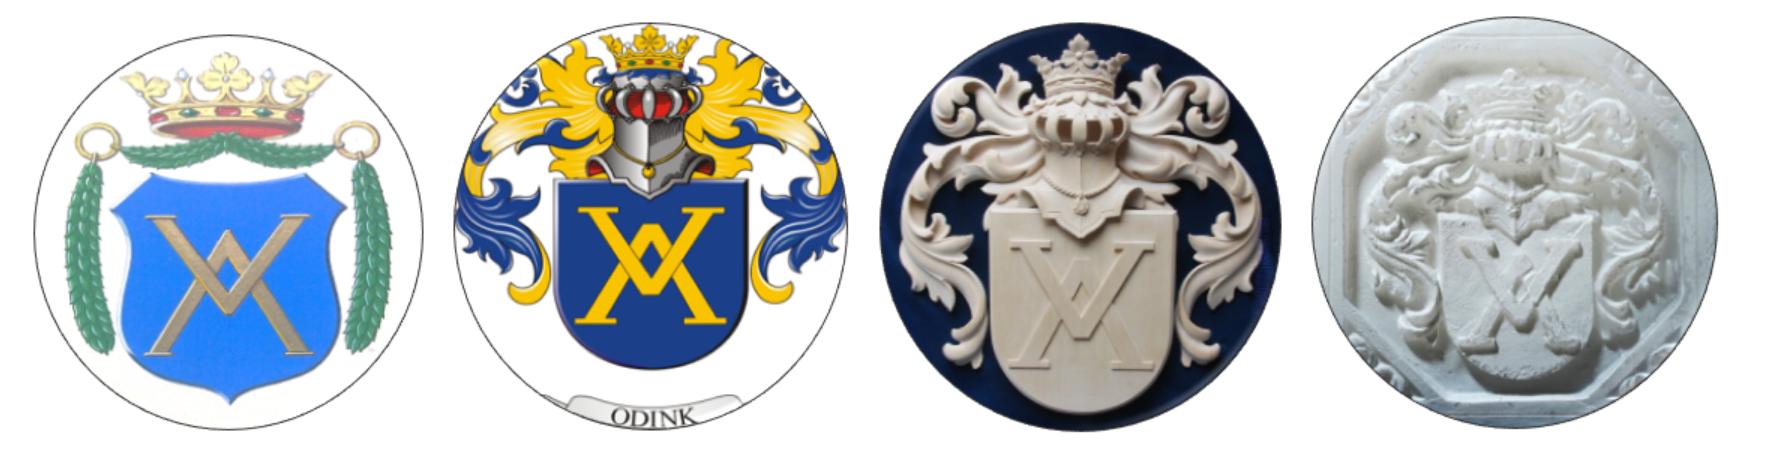 heraldic signs.PNG